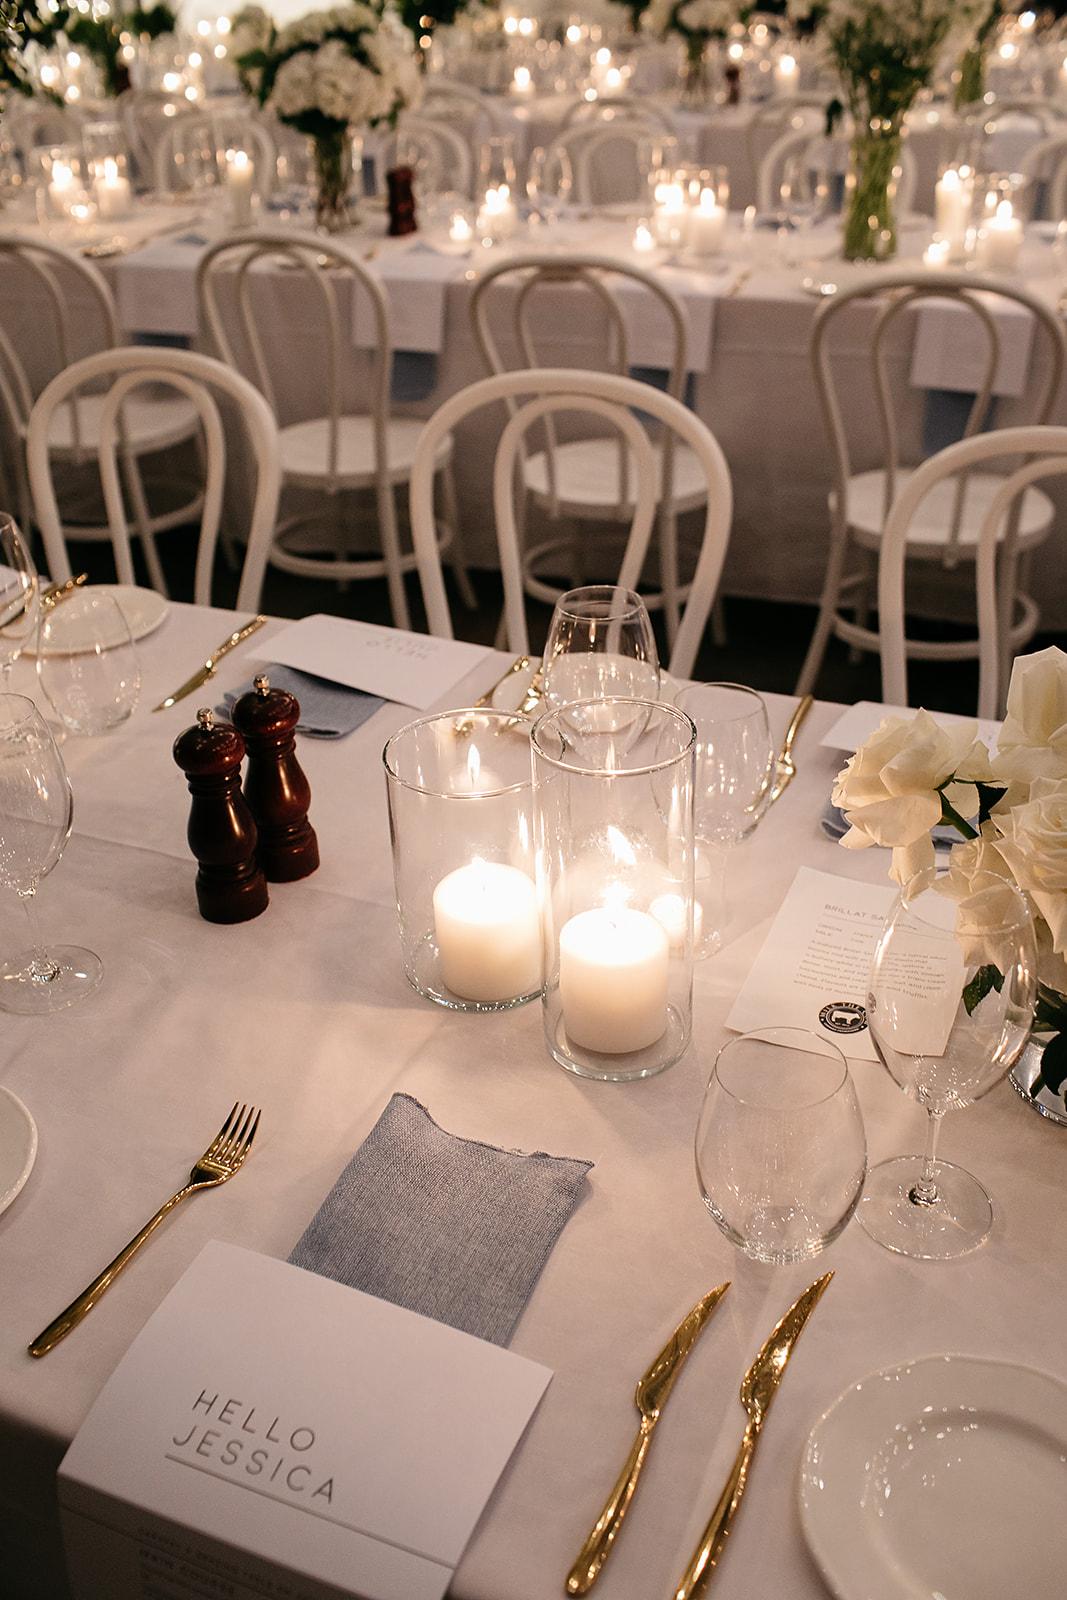 Dancing & Dessert - Victoria Winery reception